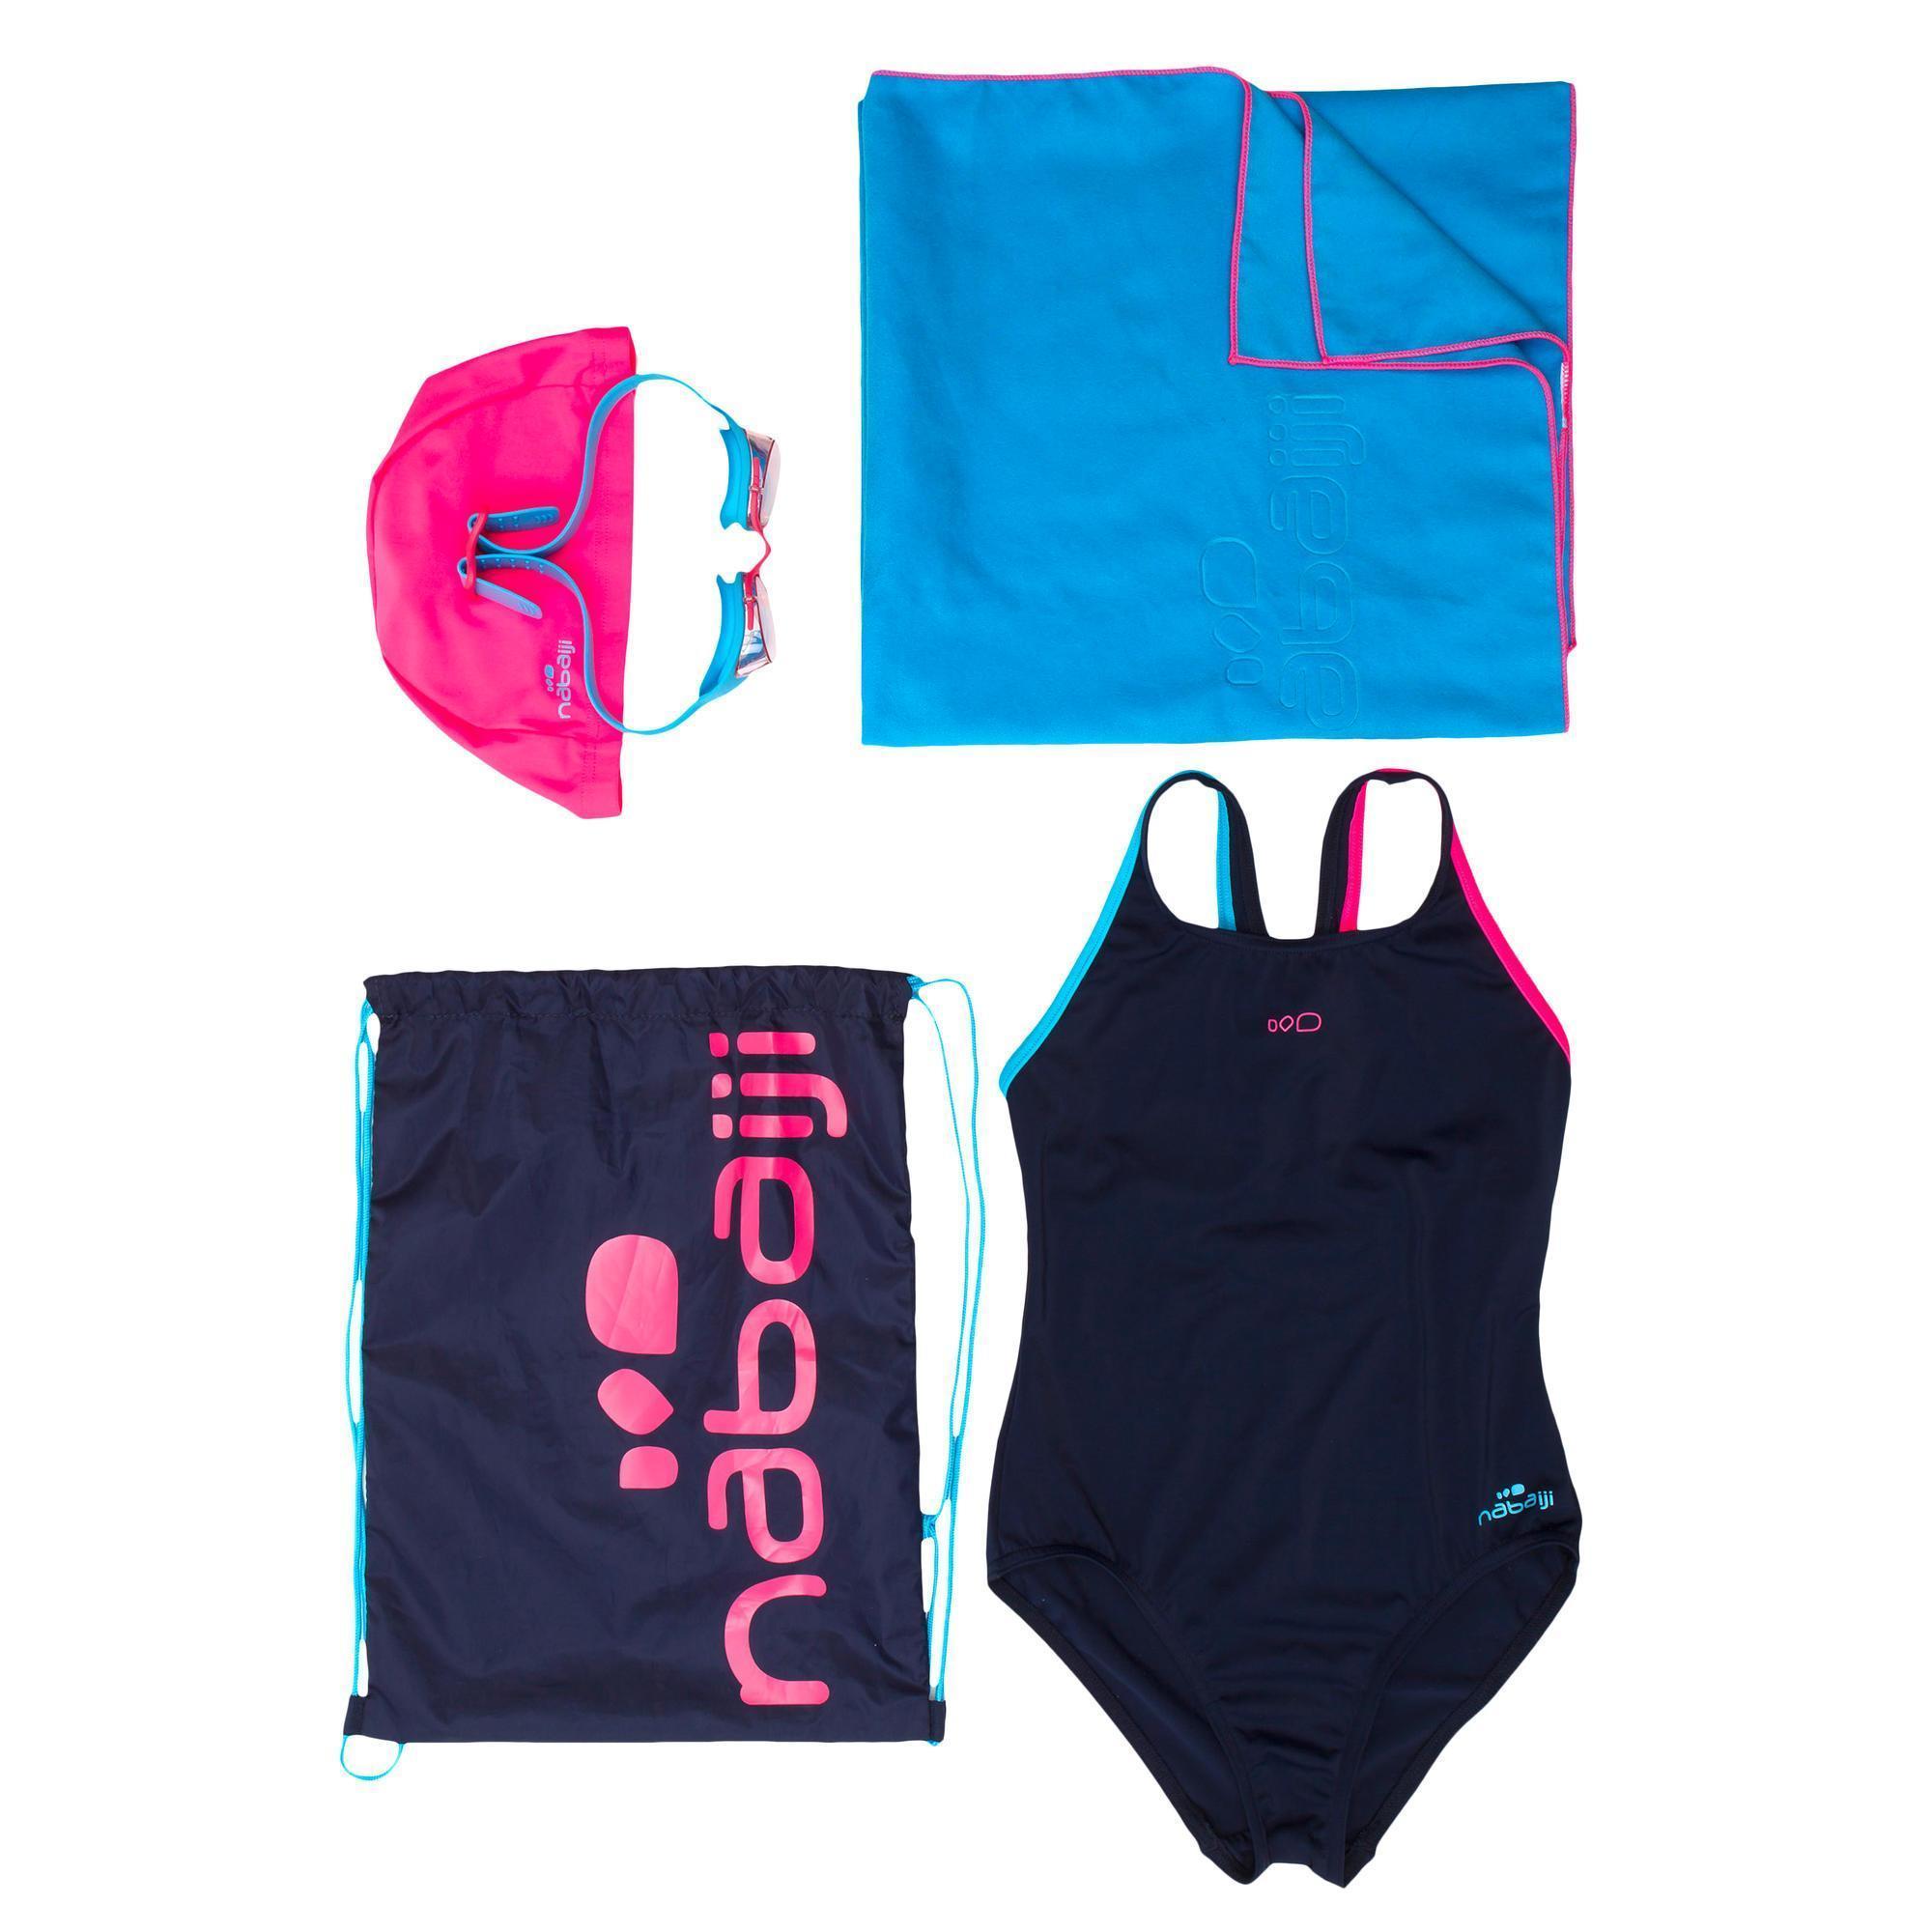 Leony swimming set swimming trunks goggles cap towel for Decathlon costumi piscina bambina